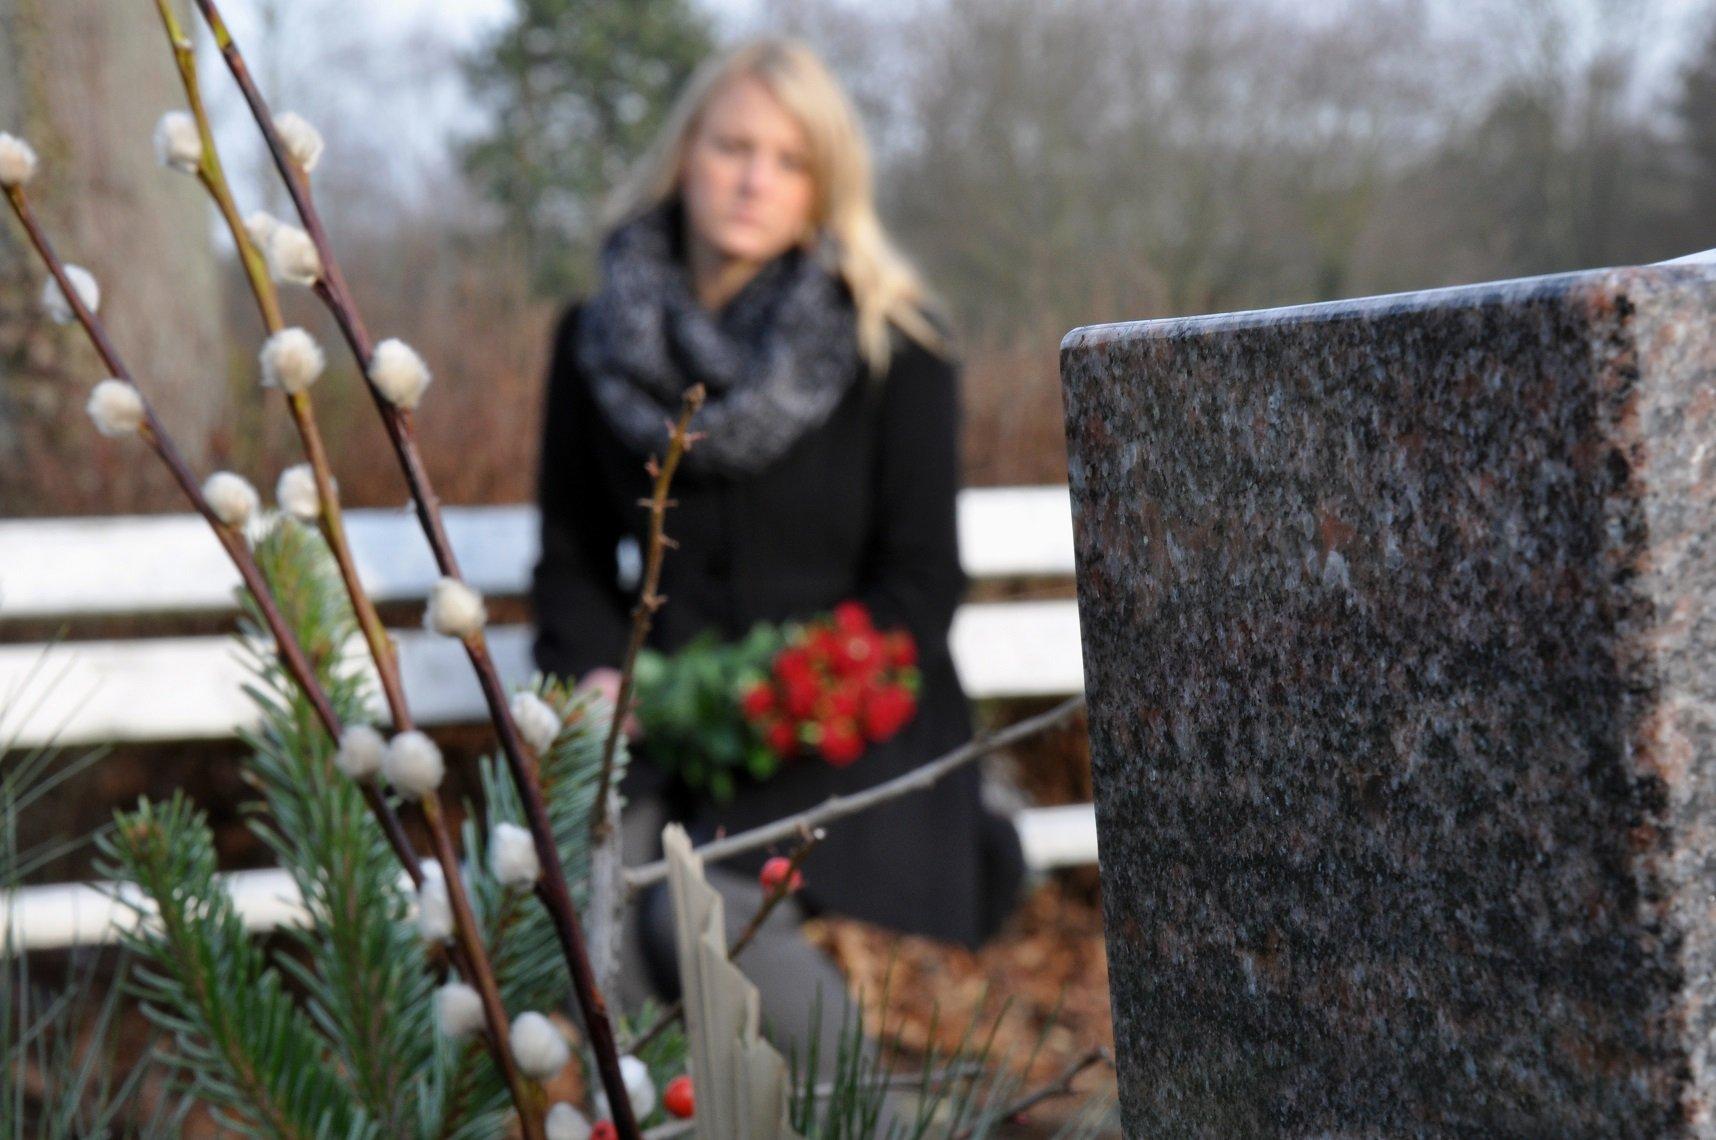 Mujer visita tumba en cementerio || Fuente: Shutterstock